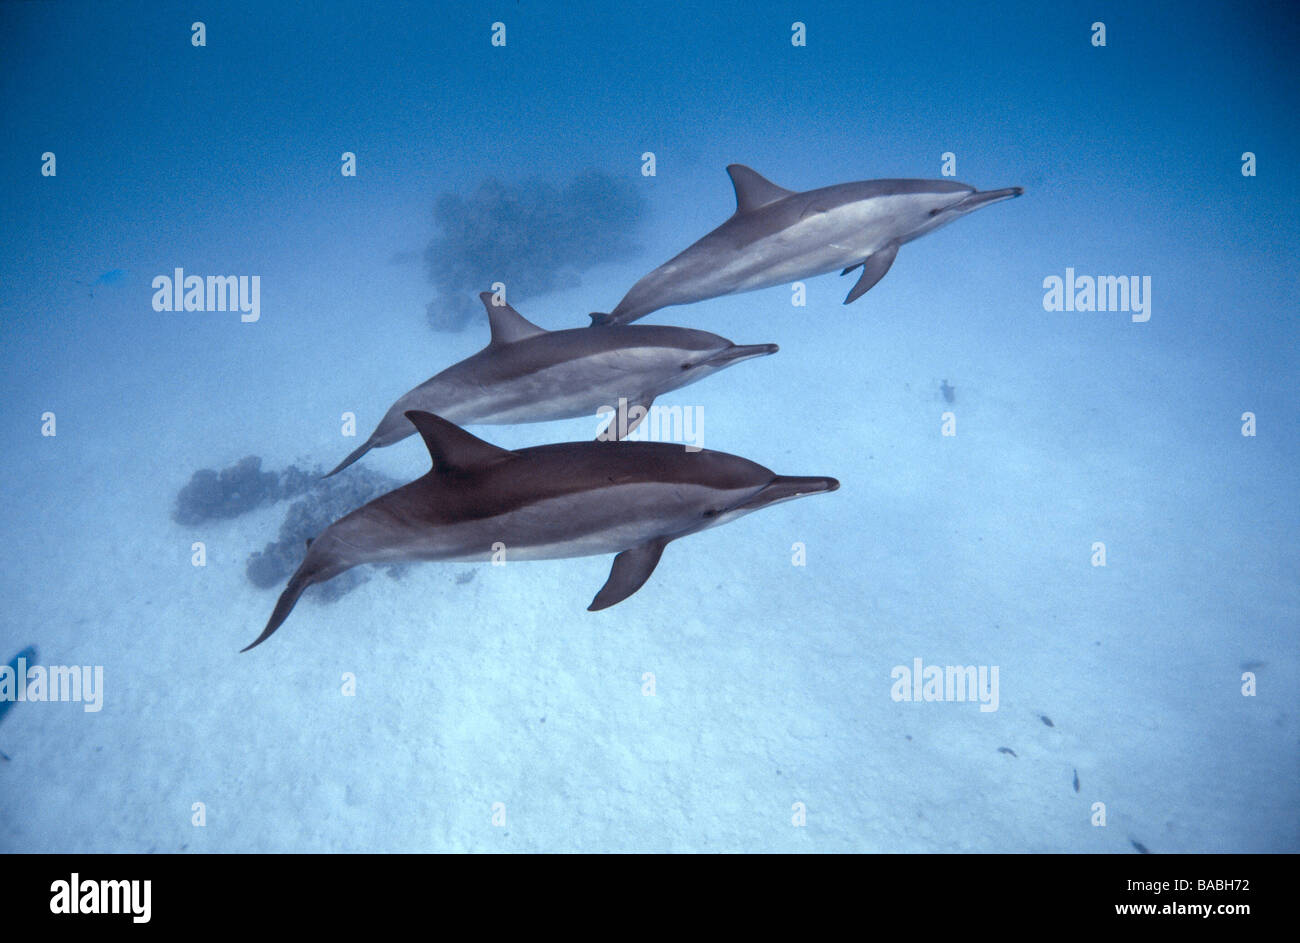 Red Sea dolphins Marsa Alam Samadai Bay, underwater, clear water, blue water, scuba, diving, ocean, sea, snorkel, Stock Photo